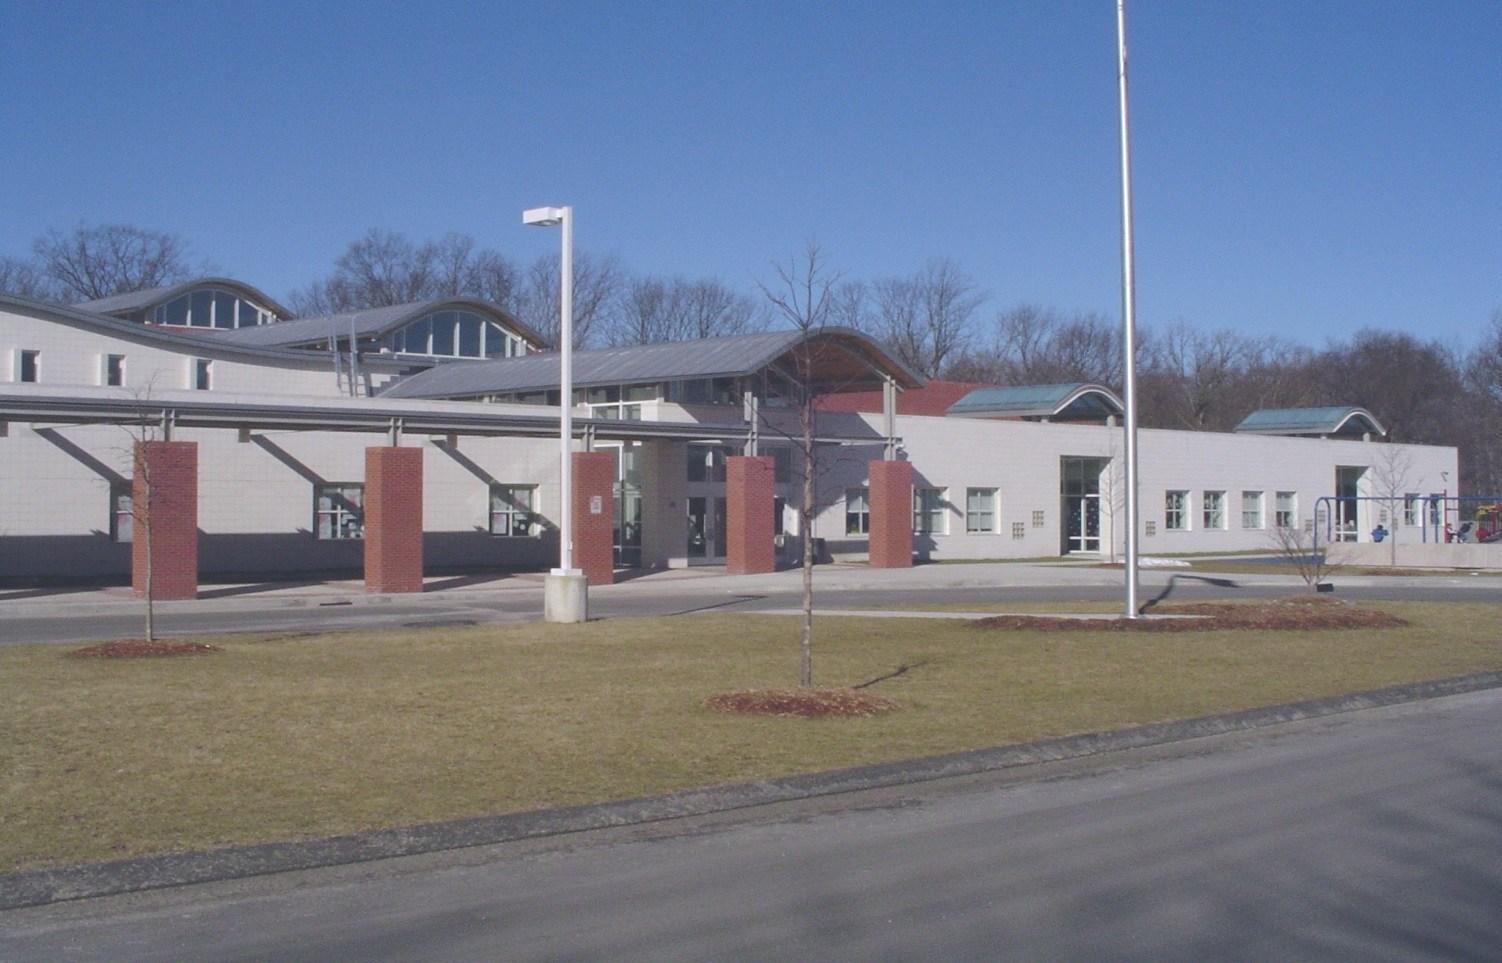 McKinley Elementary School (Fairfield Public Schools)